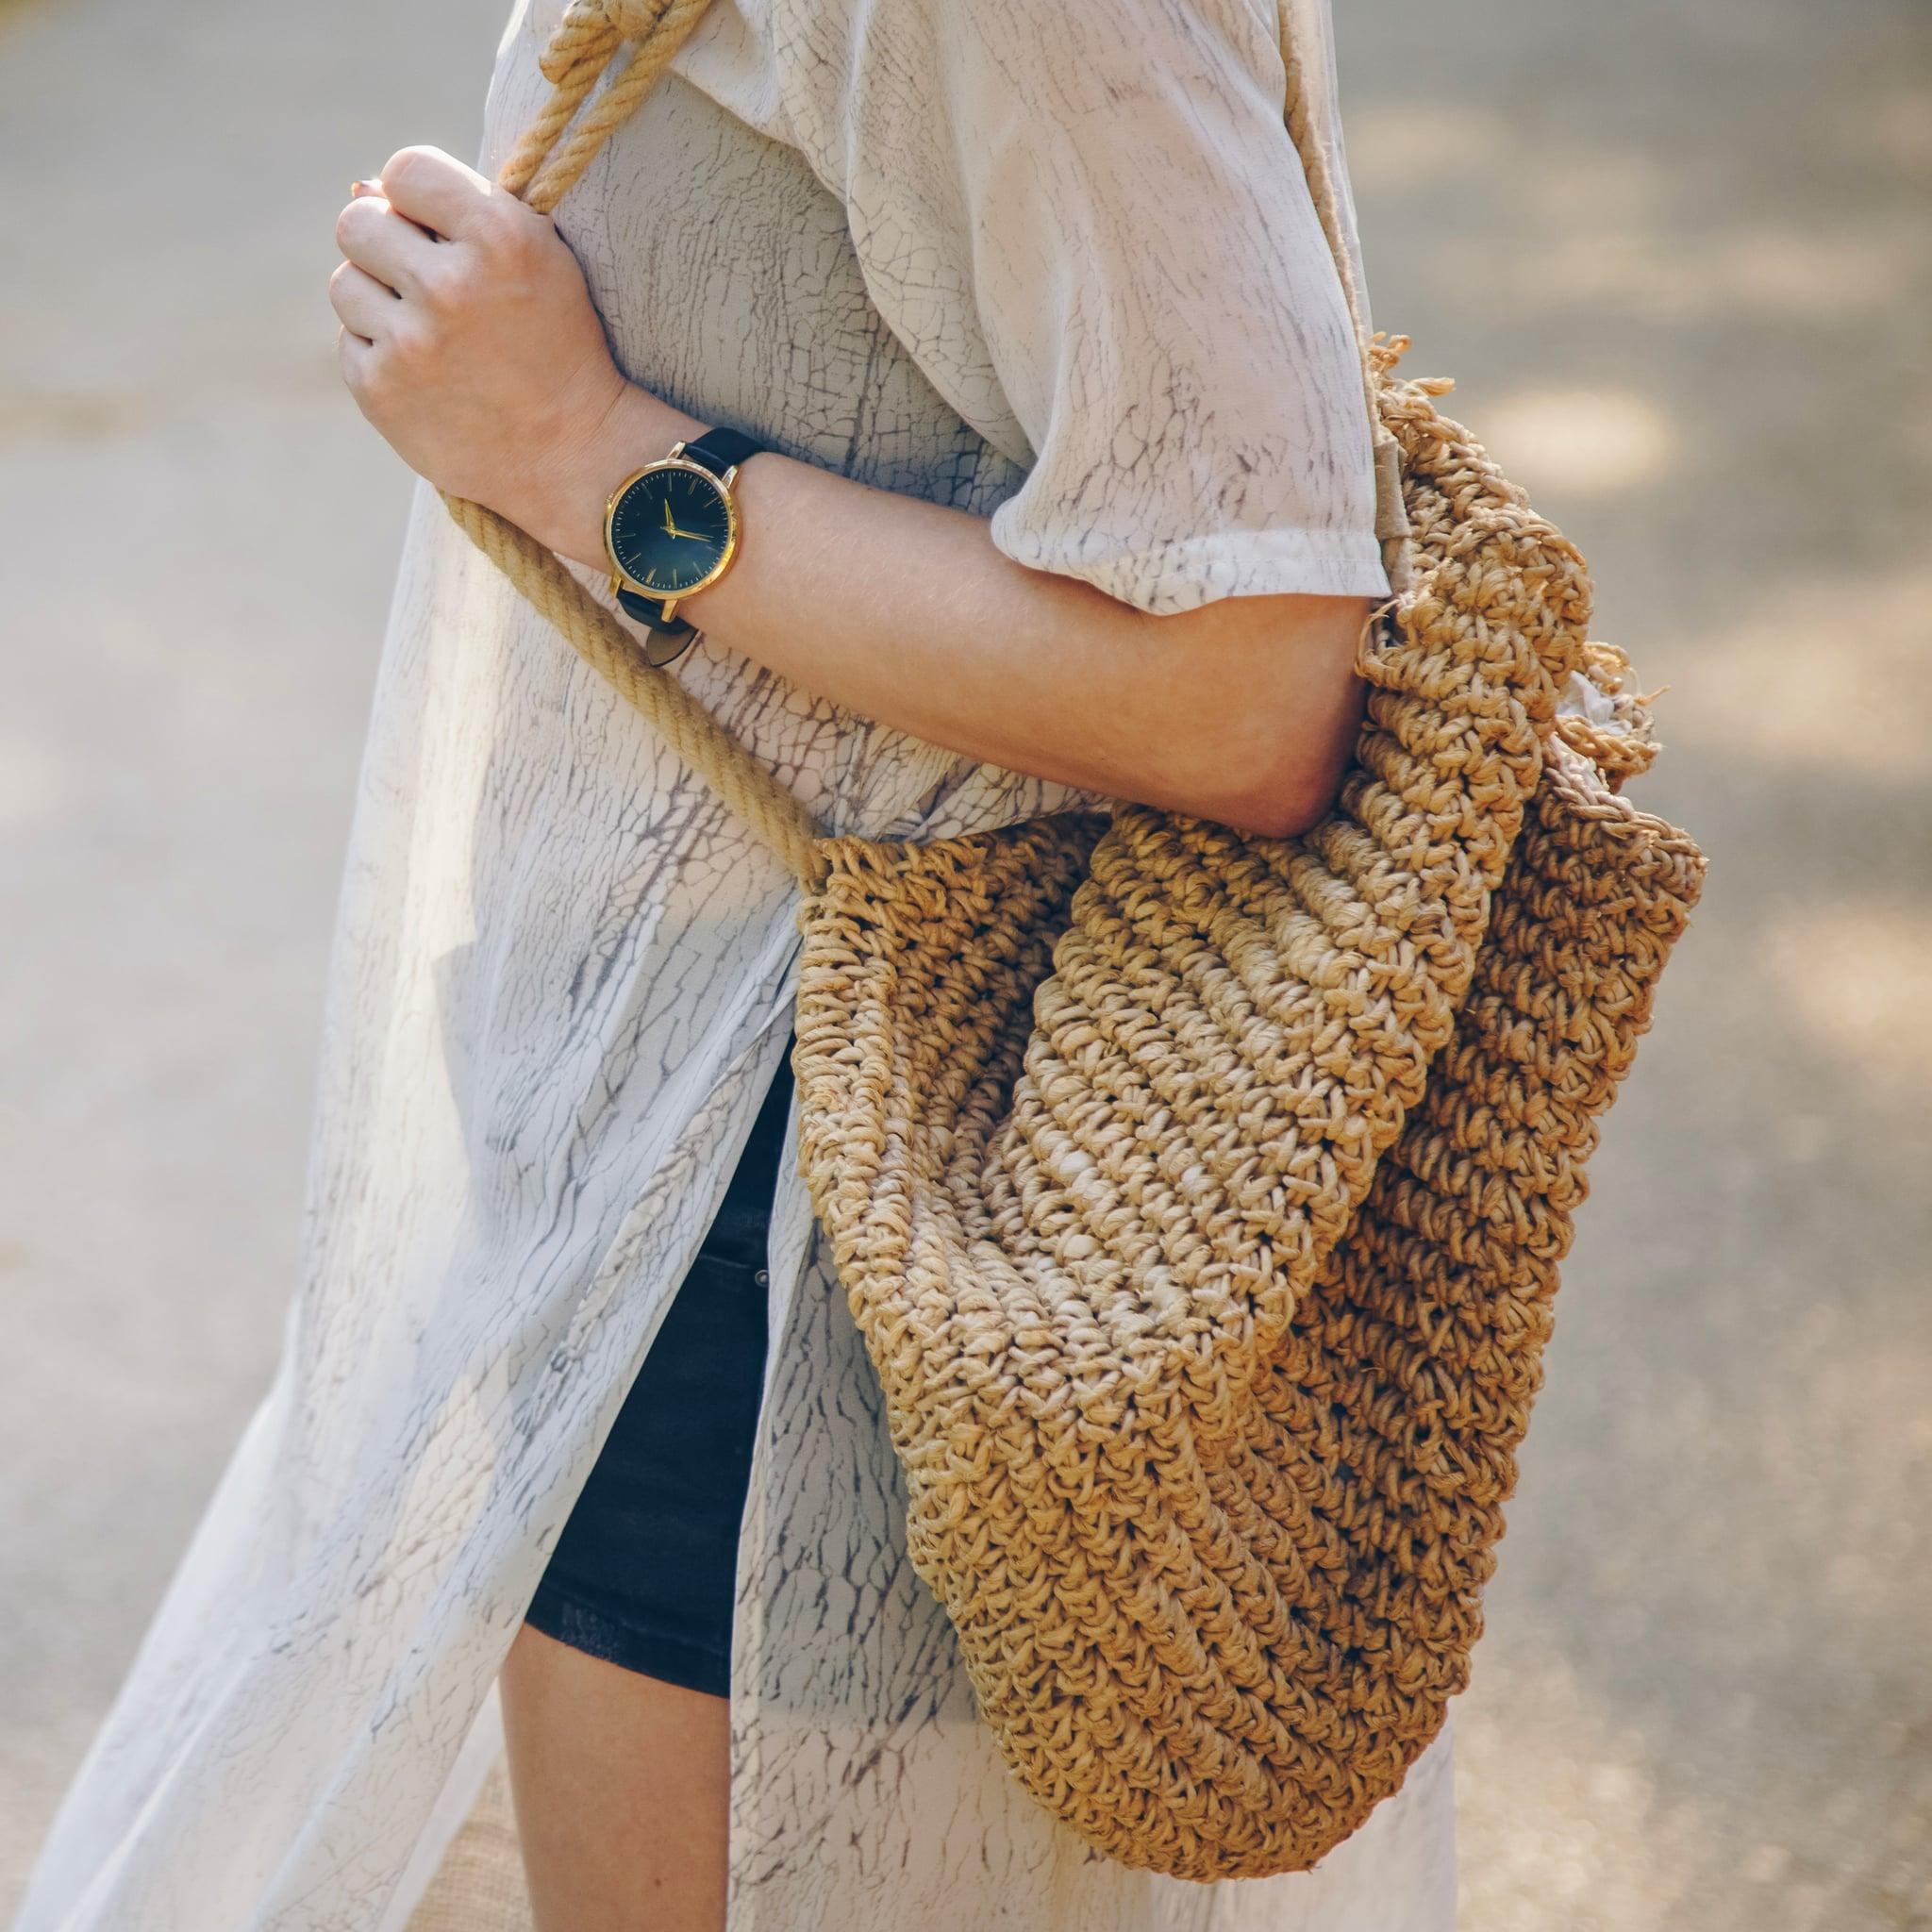 Close up of a stylish woman wearing a summer dress and holding a straw handbag while wearing a stylish wristwatch; Shutterstock ID 1243464847; Job: -